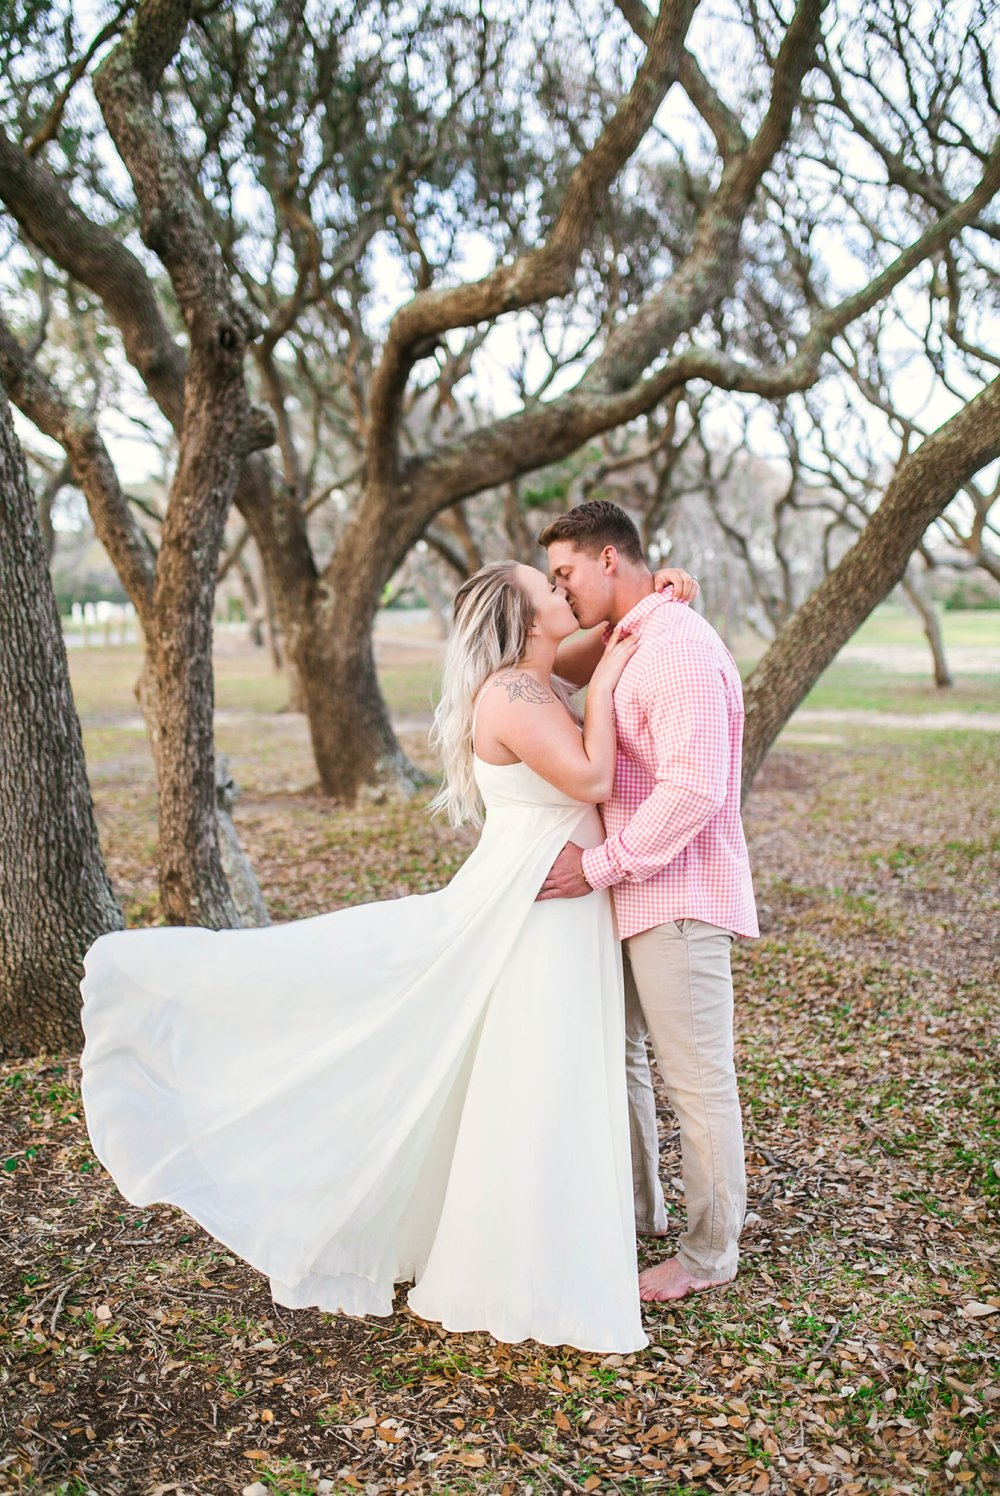 Engagement Photography Session beneath tropical trees - man kissing his fiance - girl is wearing a white flowy maxi dress from lulus - Honolulu Oahu Hawaii Wedding Photographer - Johanna Dye